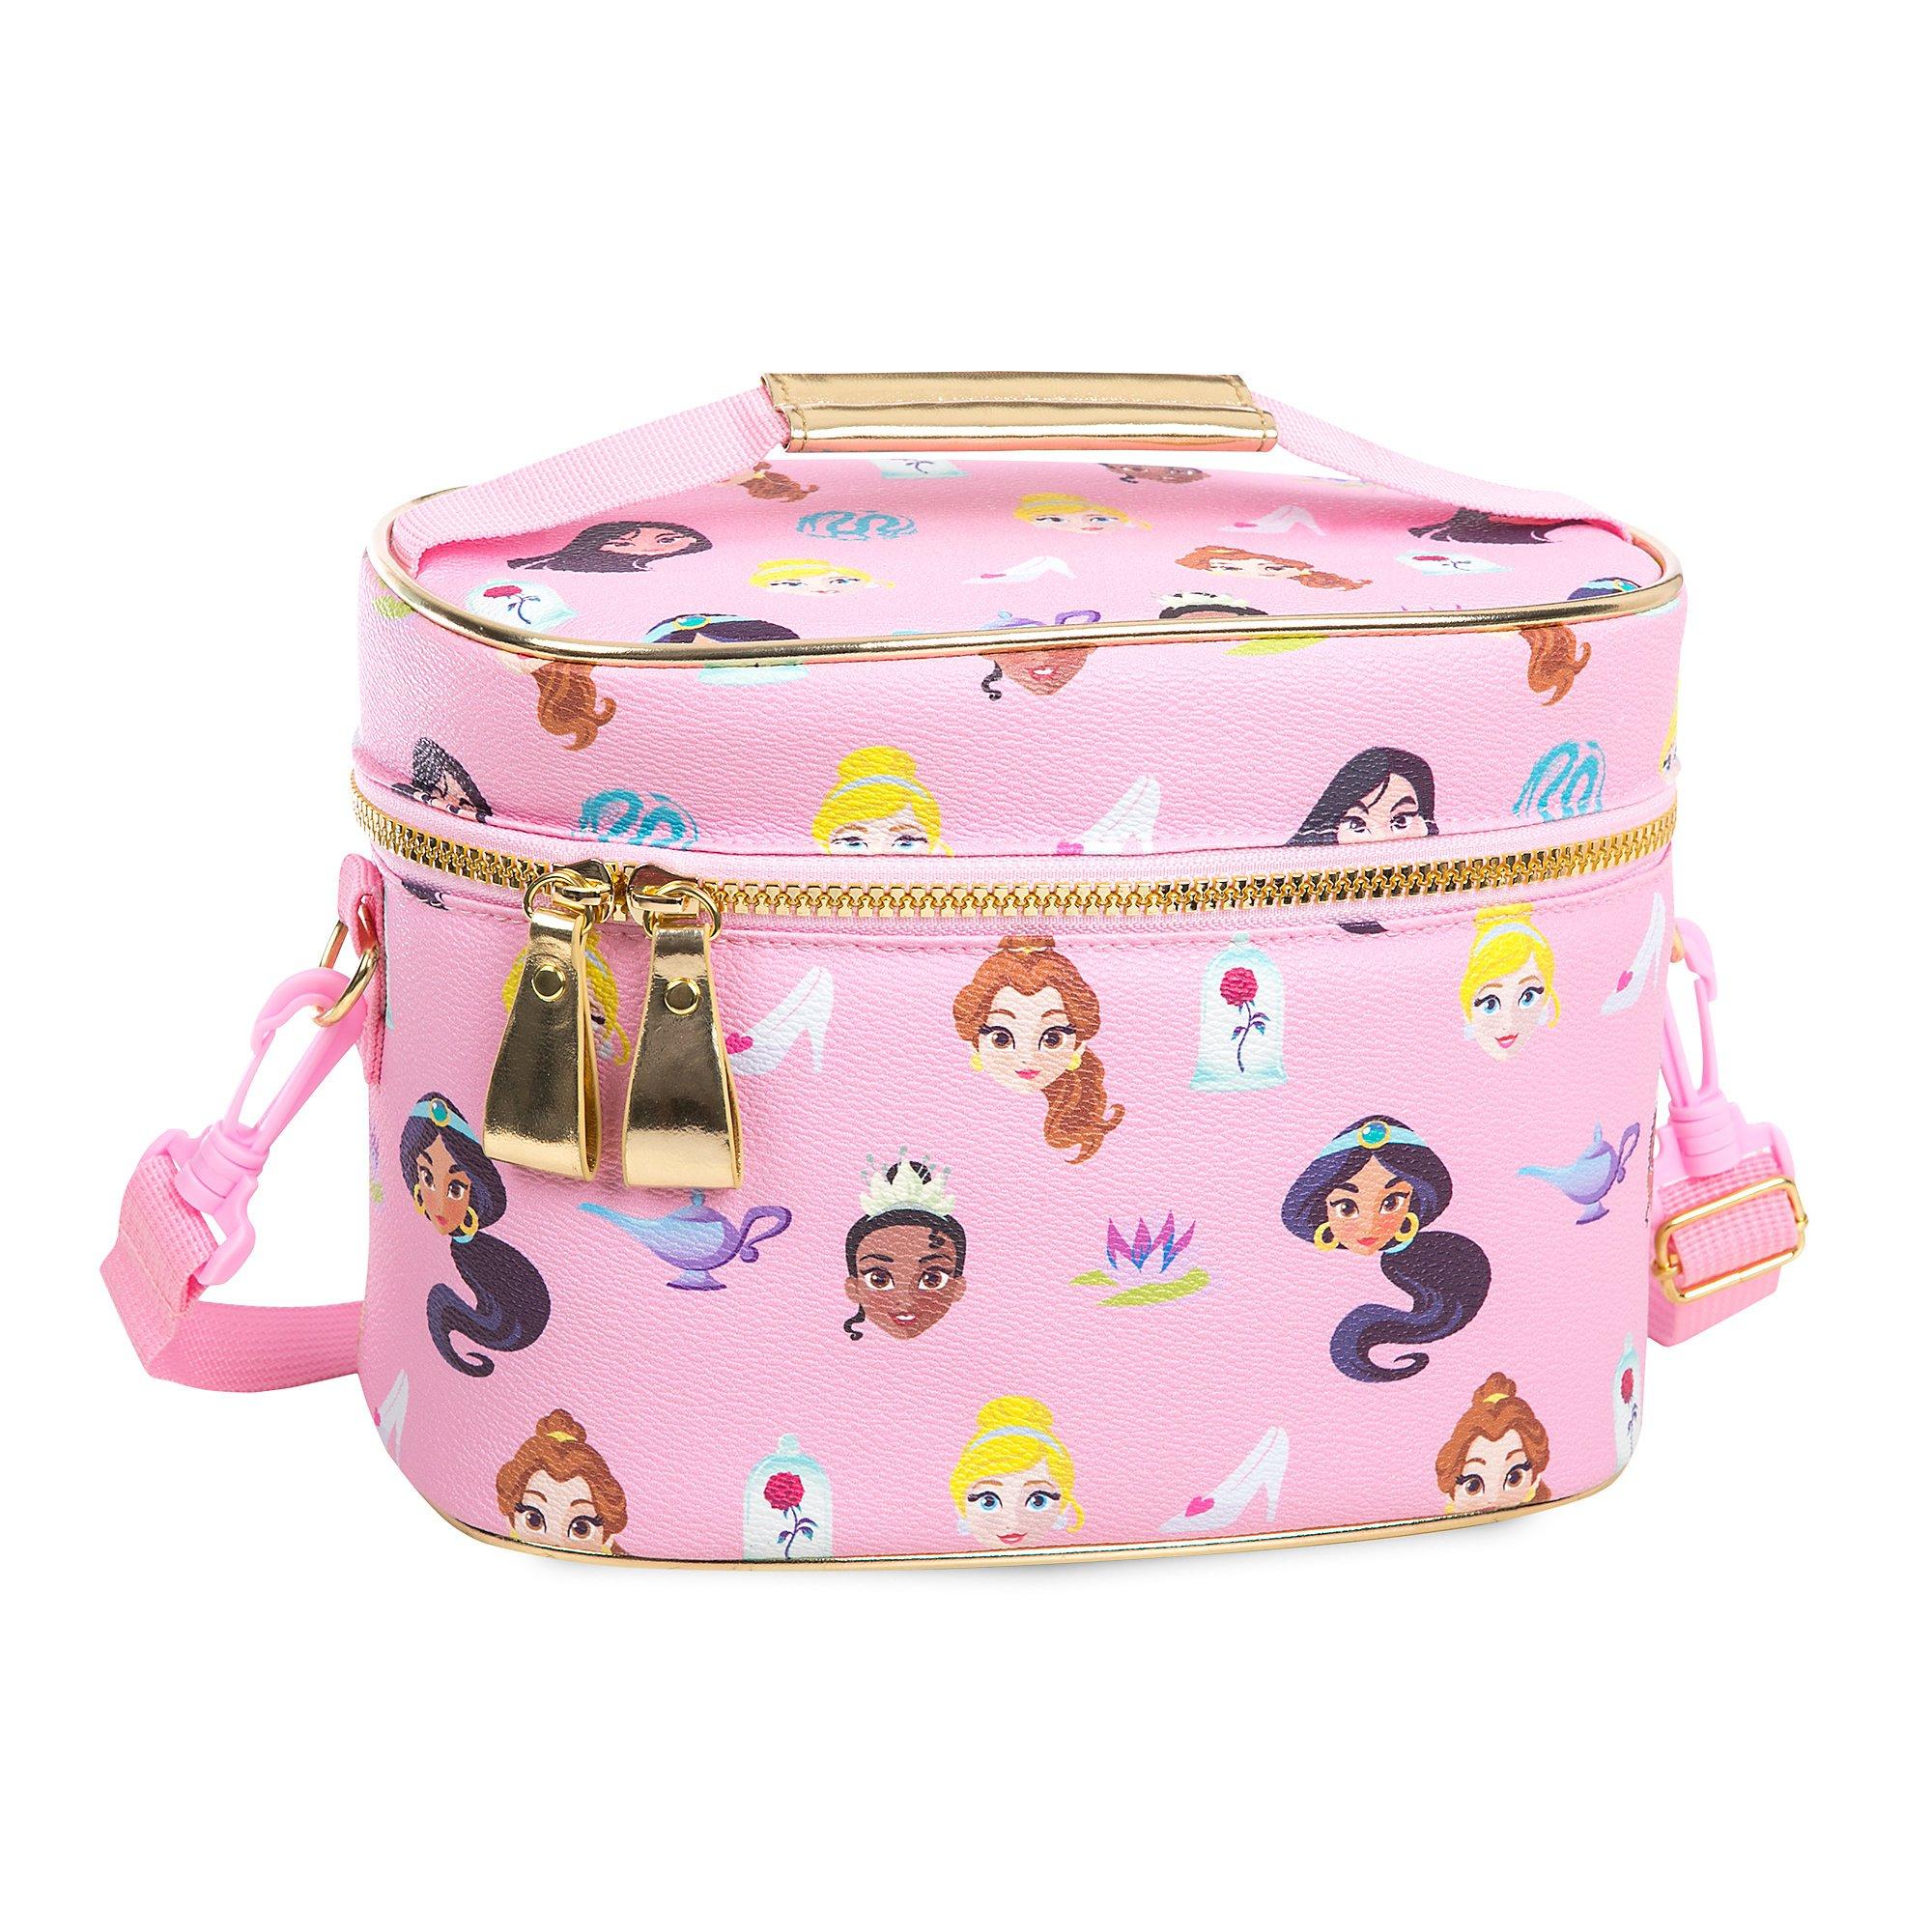 Disney Disney Princess Lunch Tote for Girls Pink